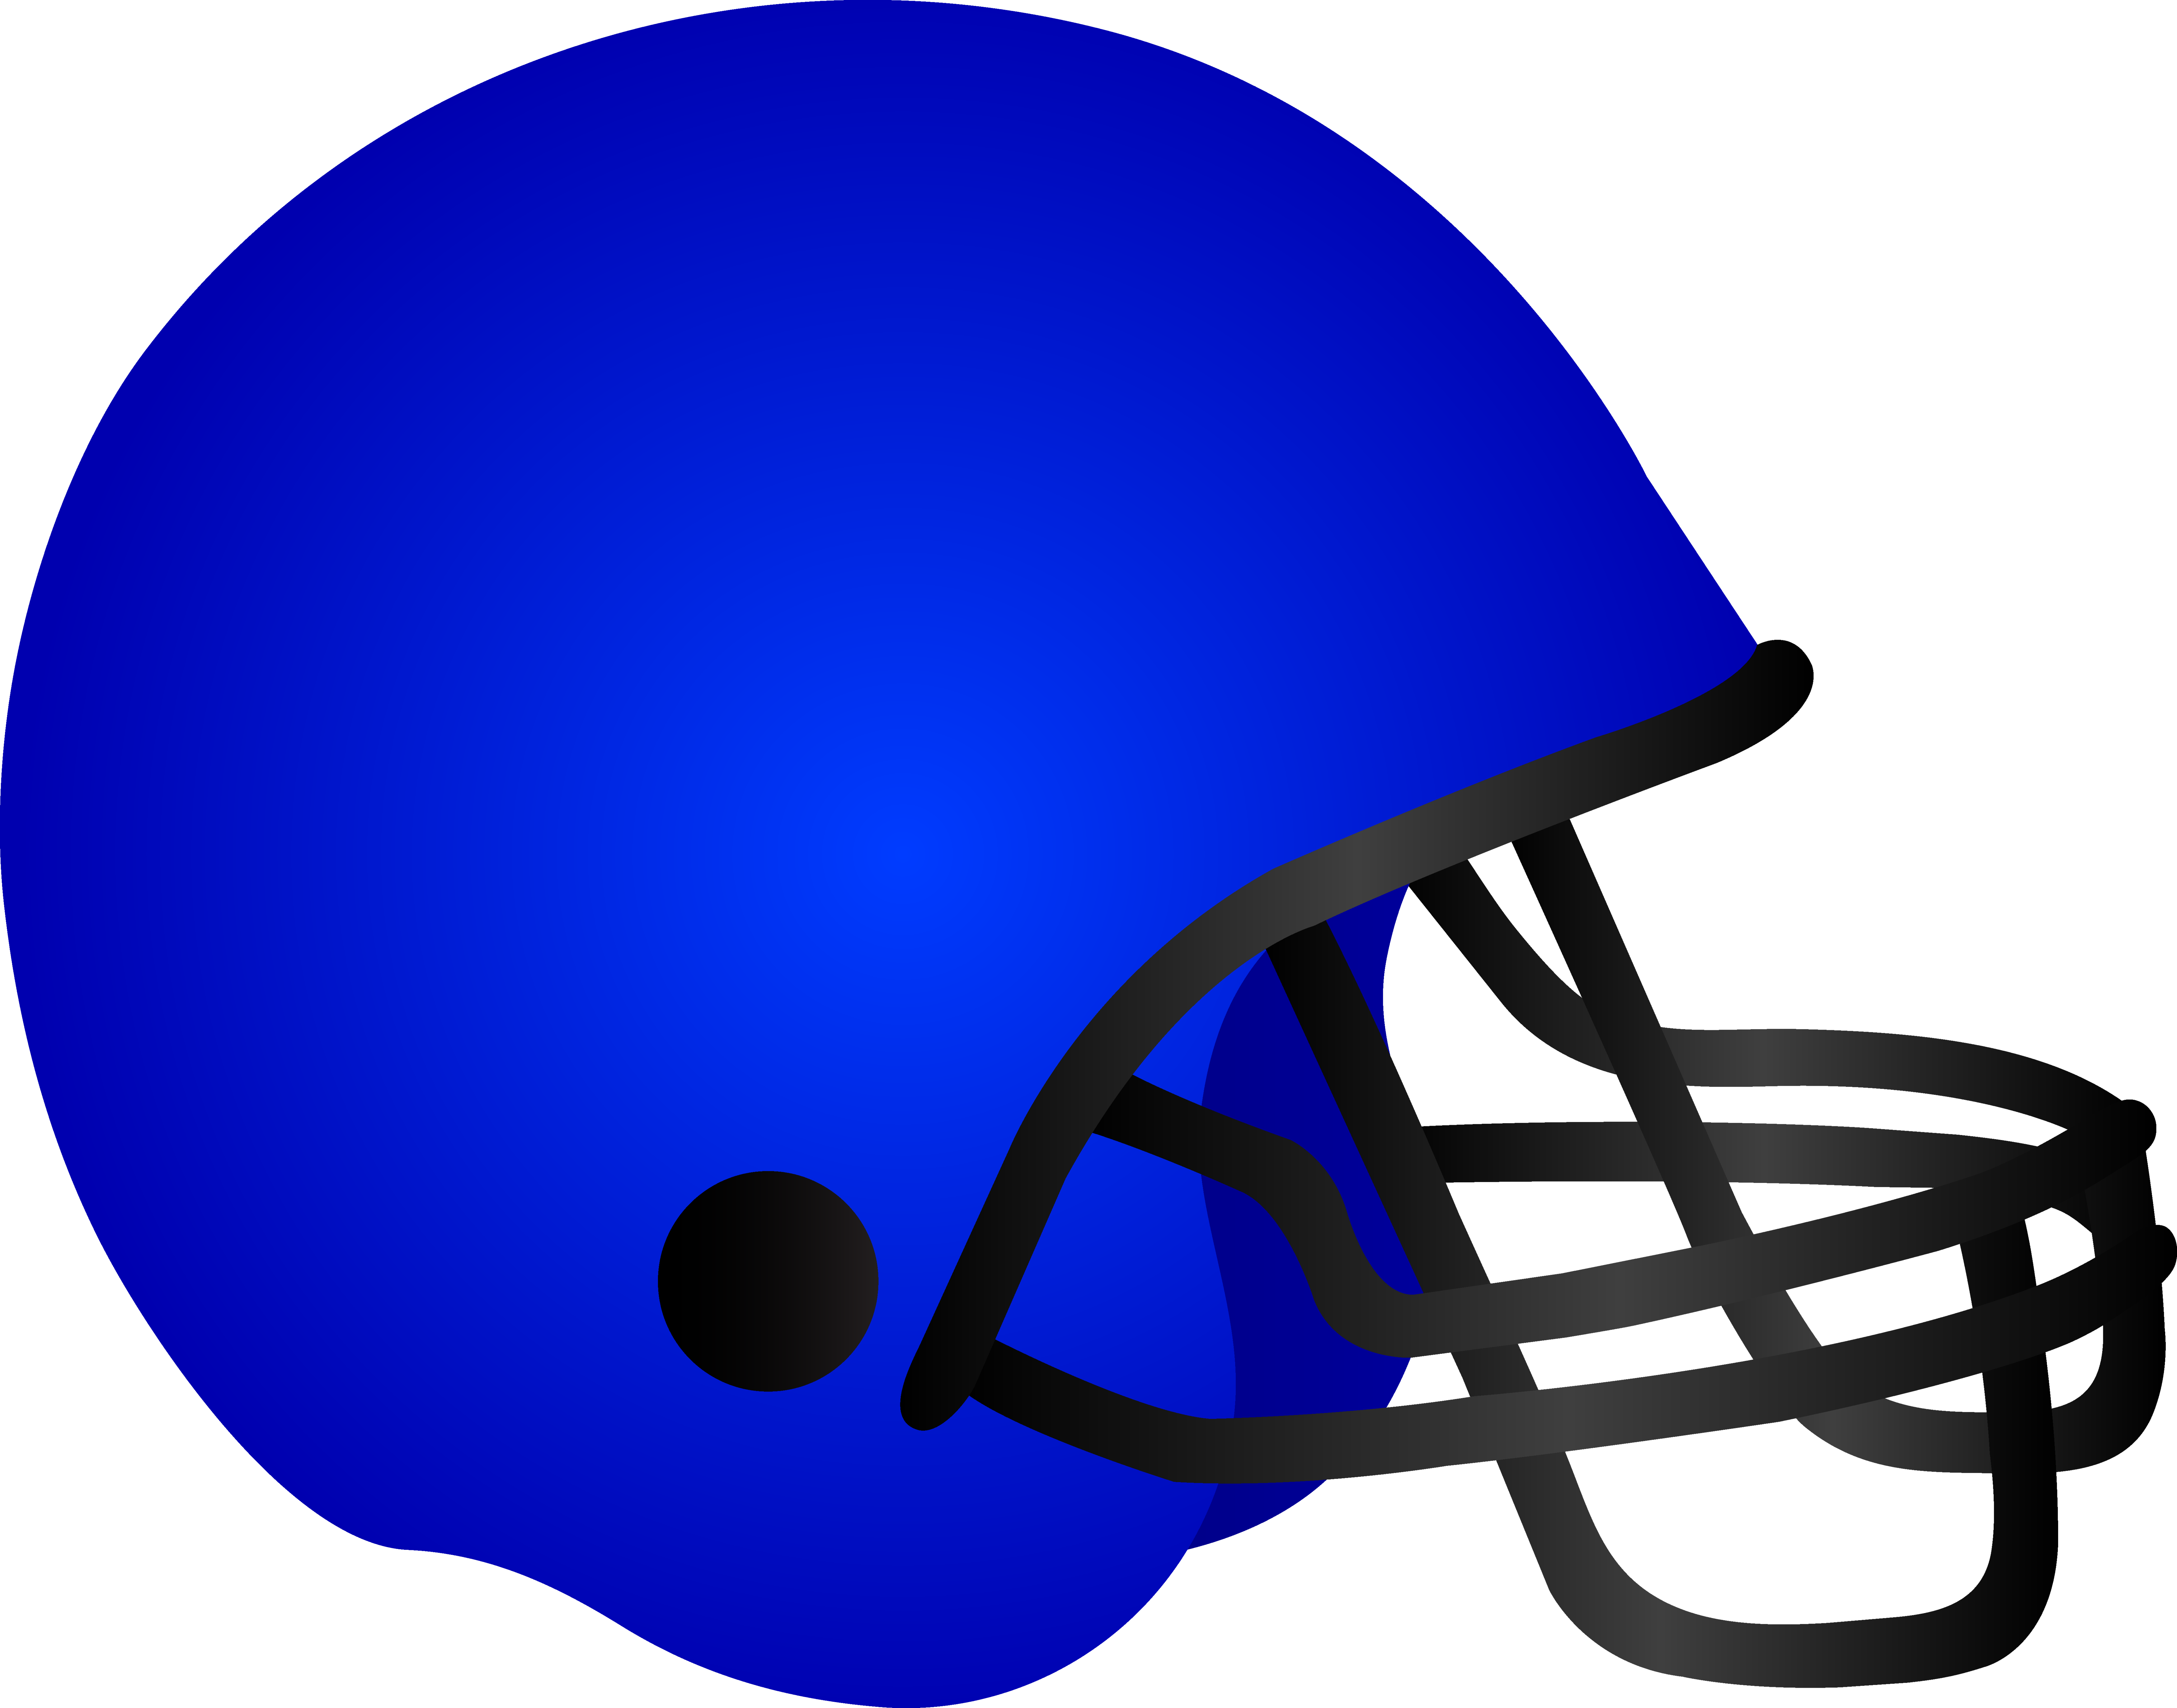 6994x5488 Cartoon Football Helmet Clipart Free To Use Clip Art Resource